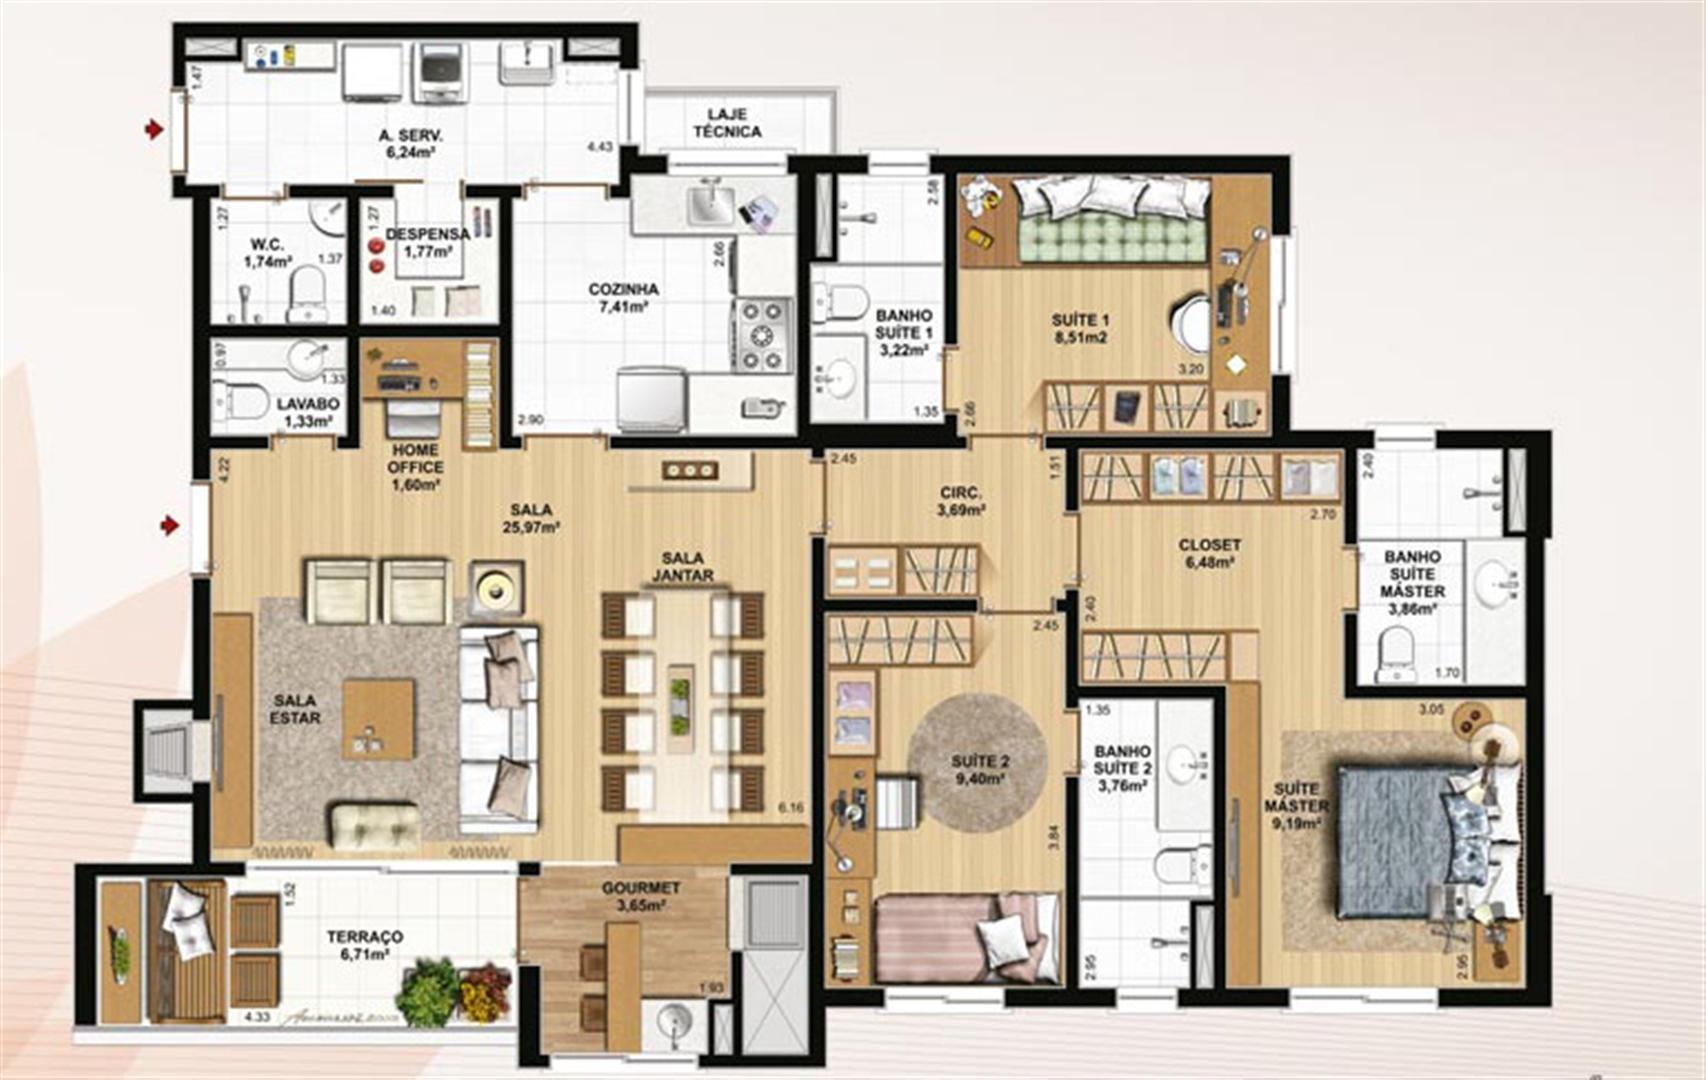 129 m² privativos, despensa e home office | Le Jardin Residencial – Apartamento no  Água Verde - Curitiba - Paraná